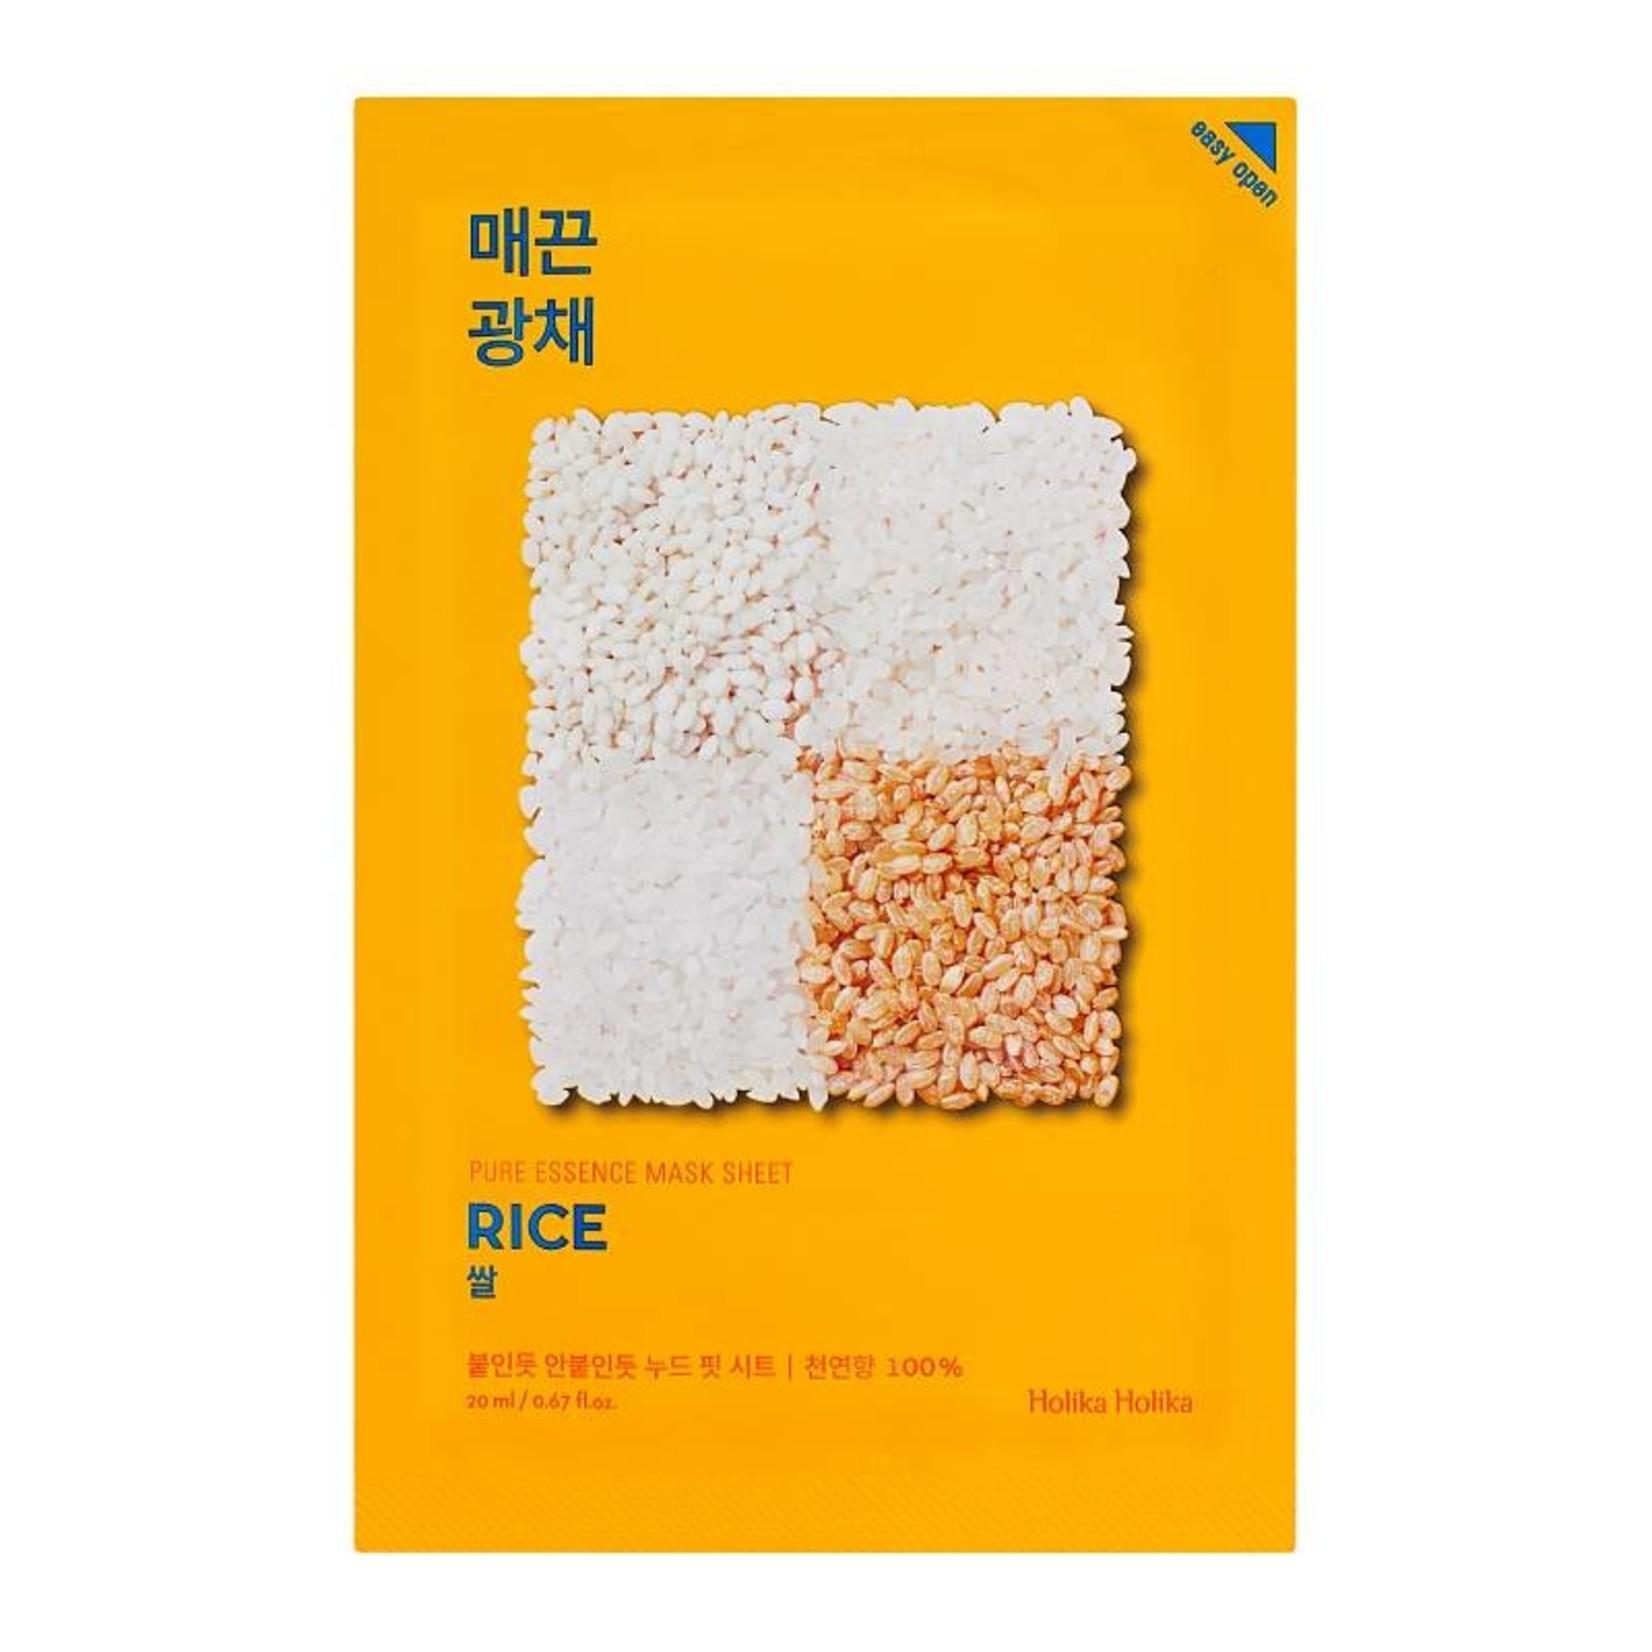 Holika Holika Pure Essence Mask Sheet Rice 10 pcs